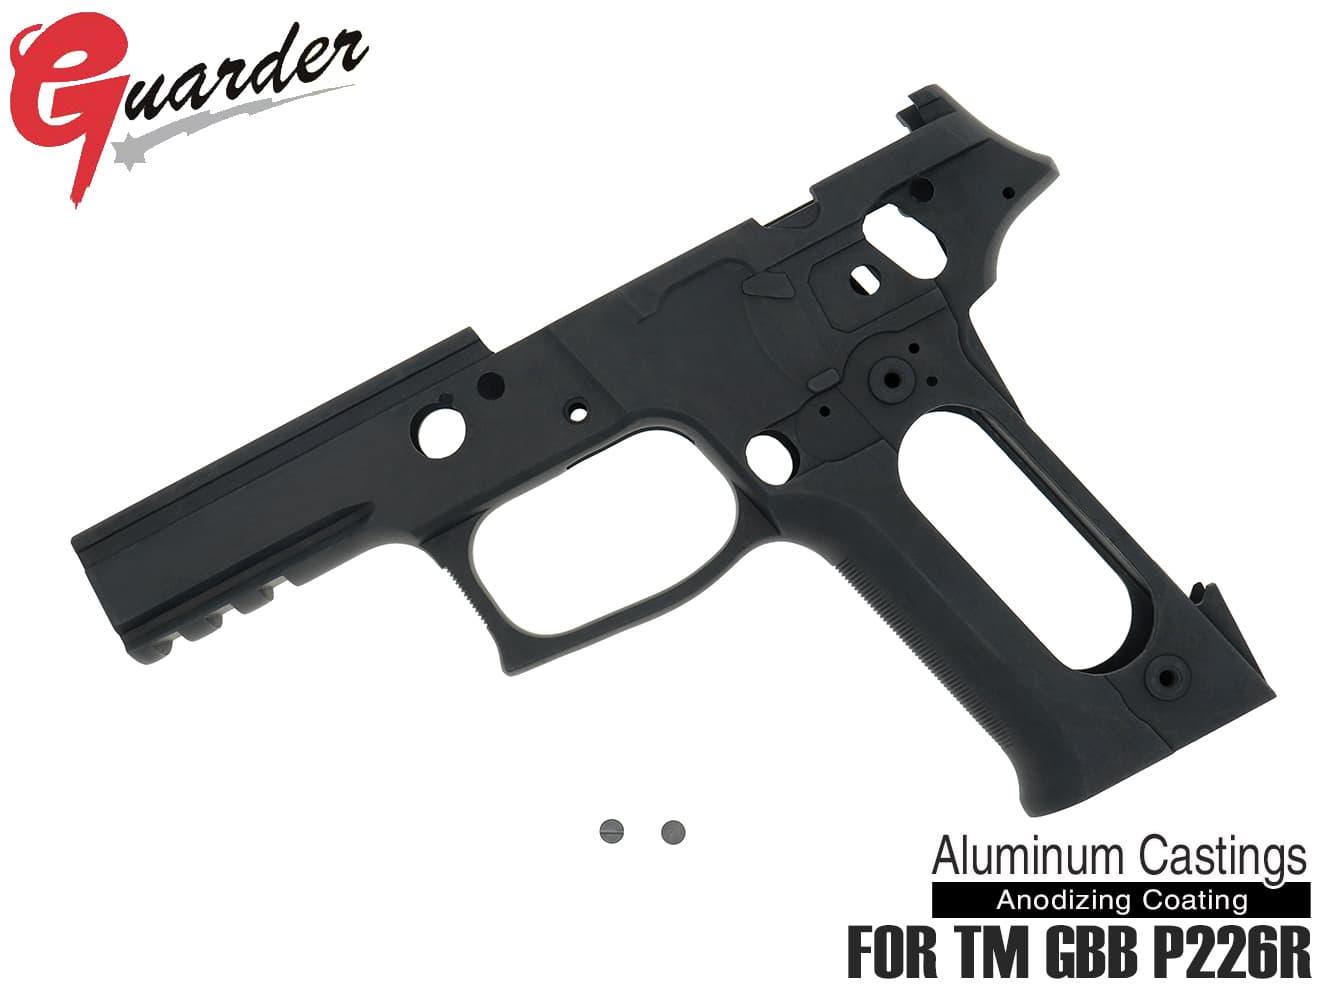 P226-62(BK)■GUARDER P226 RAIL フレームKIT Late Version Marking マルイ P226R用◆BK マルイ ガスブロ P226 RAIL対応 実物後期型形状をリアルに再現